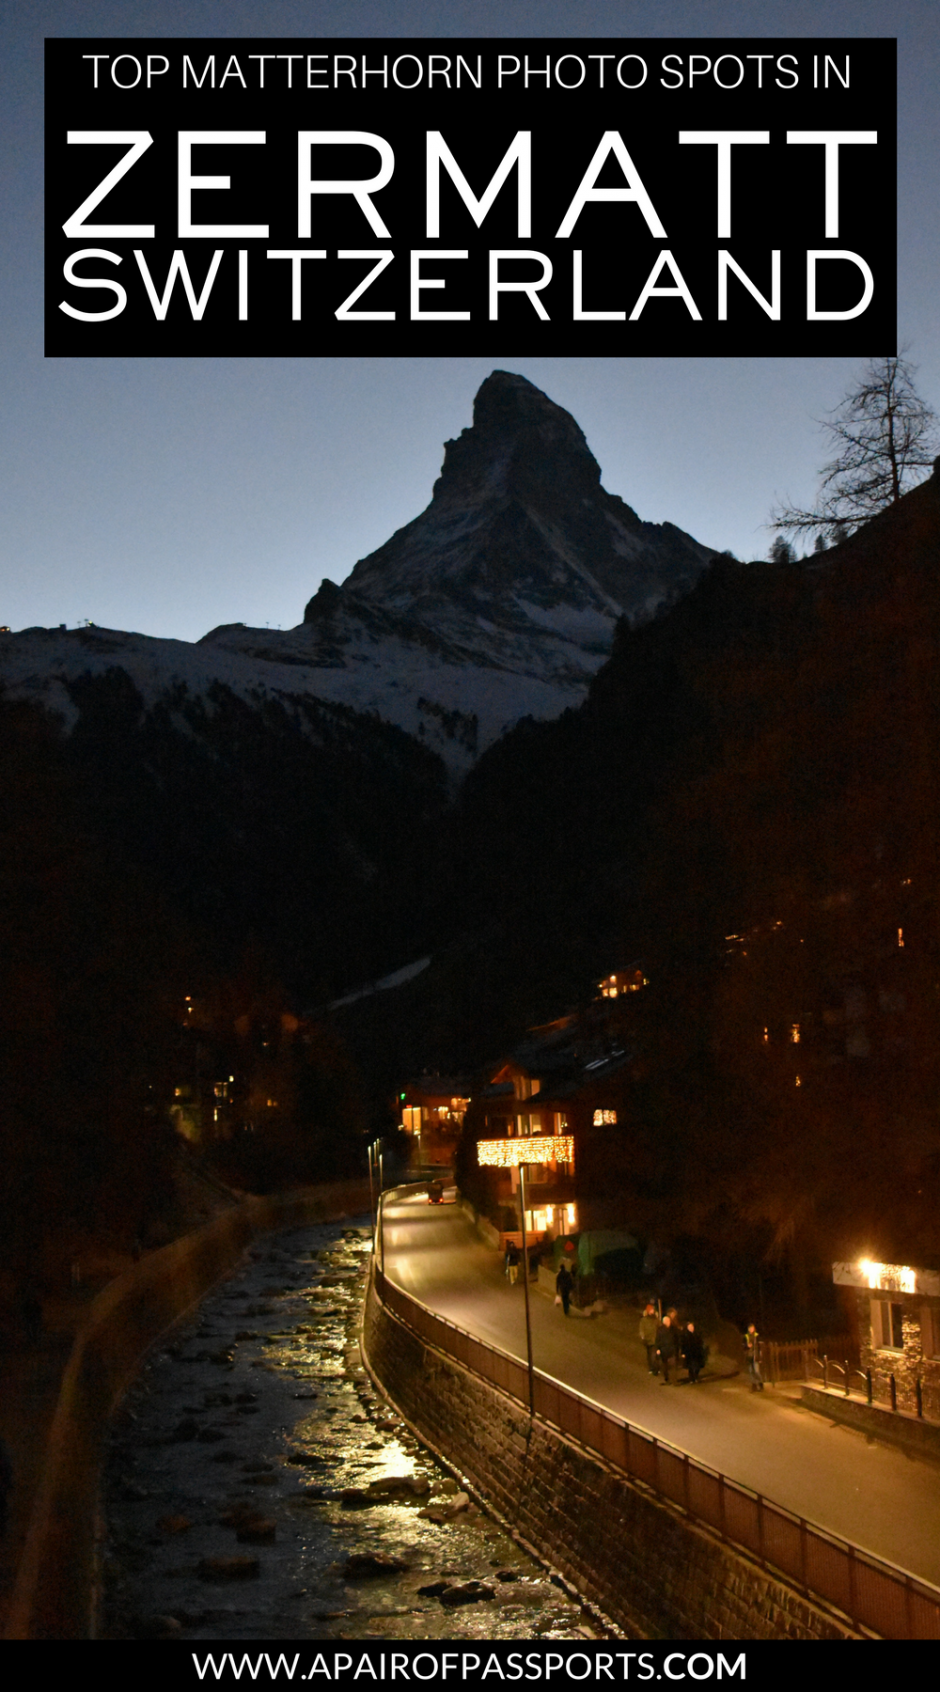 Zermatt Switzerland Best Spots For Photos Of The Matterhorn Zermatt Switzerland Zermatt Switzerland Travel